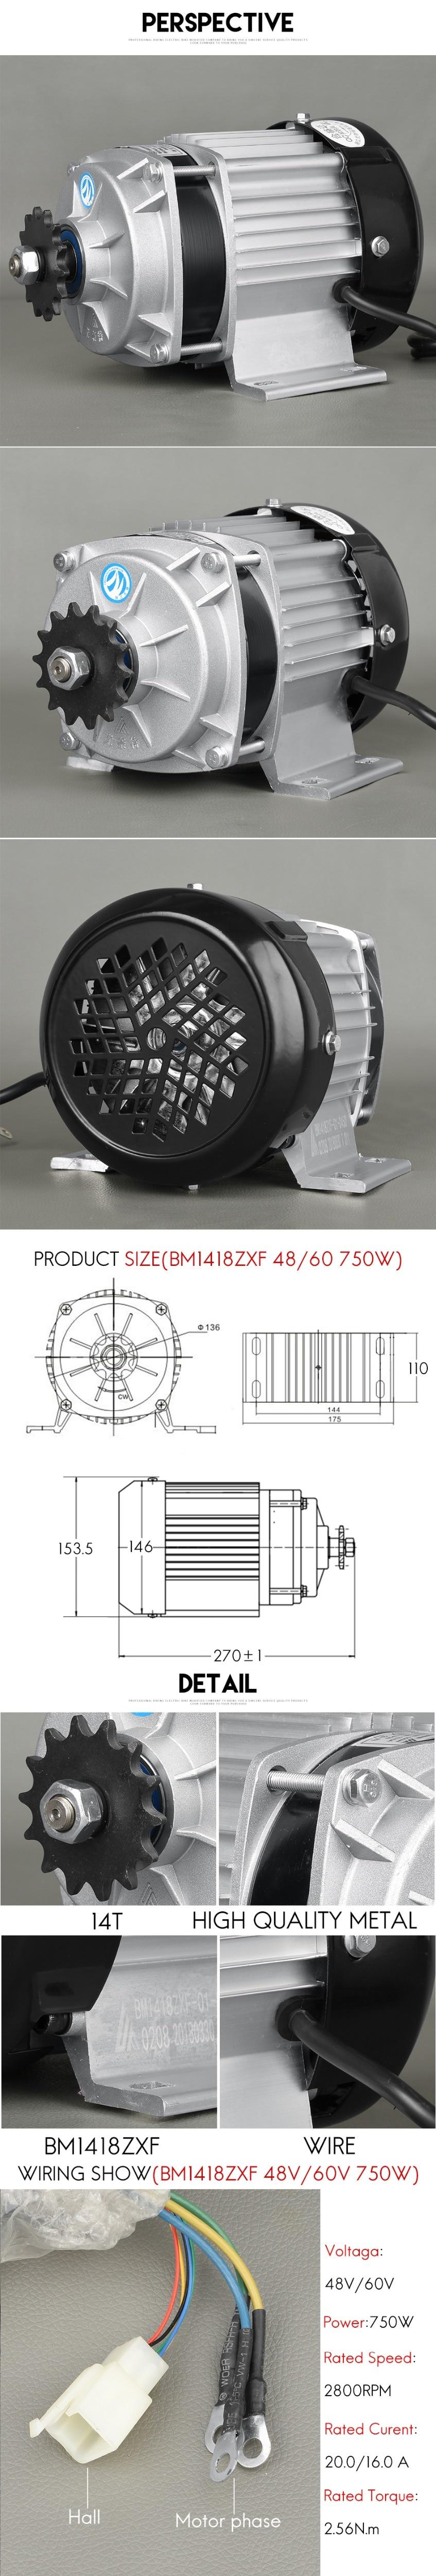 unitemotor triciclo bldc rickshaw kit de conversão